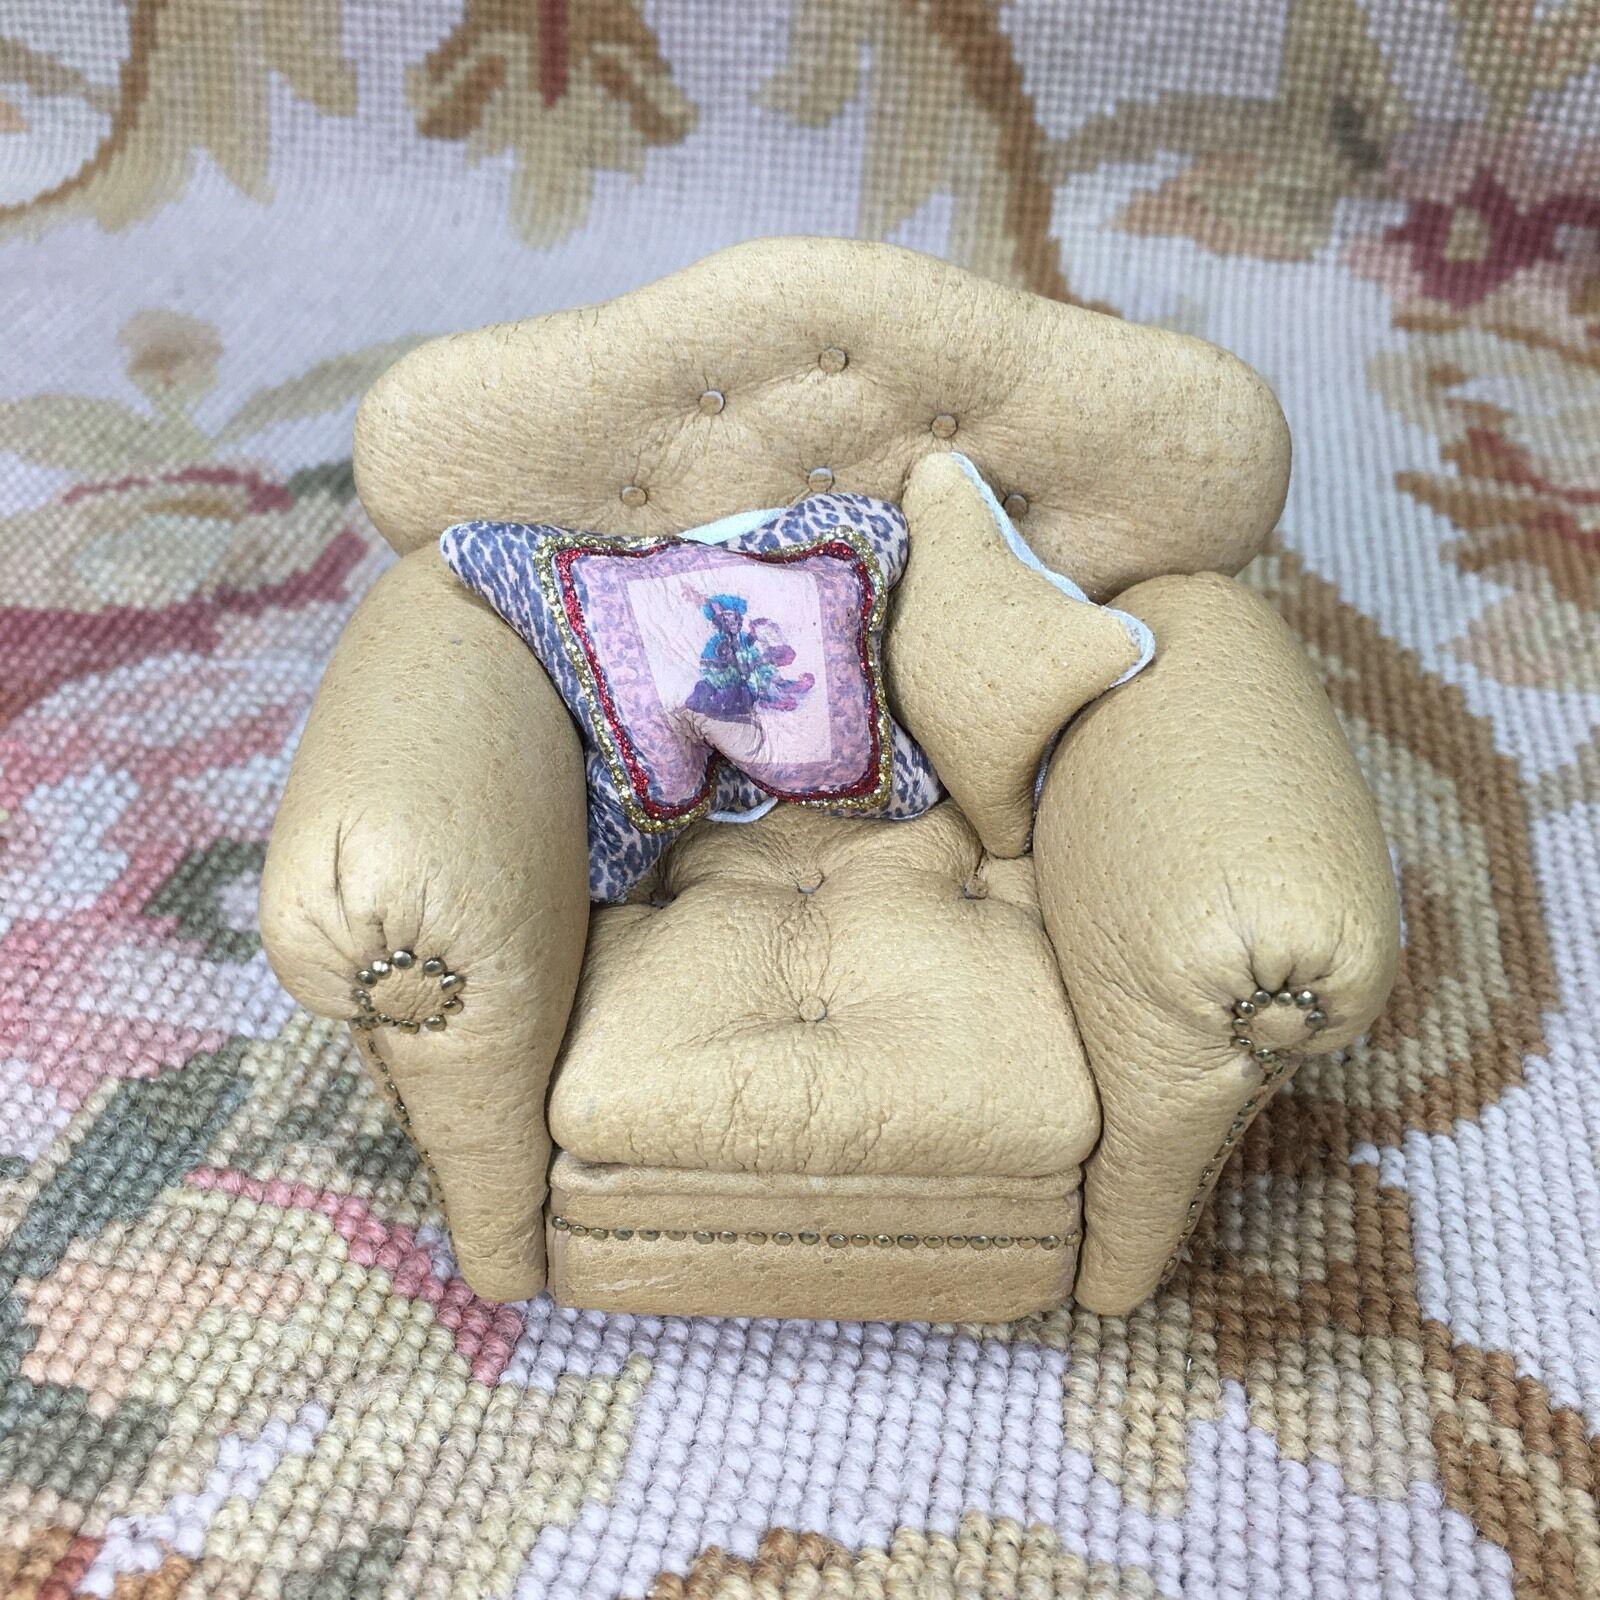 Pat Tyler Dollhouse Miniature Tan Leather Club Chair Seat W Pillows p401